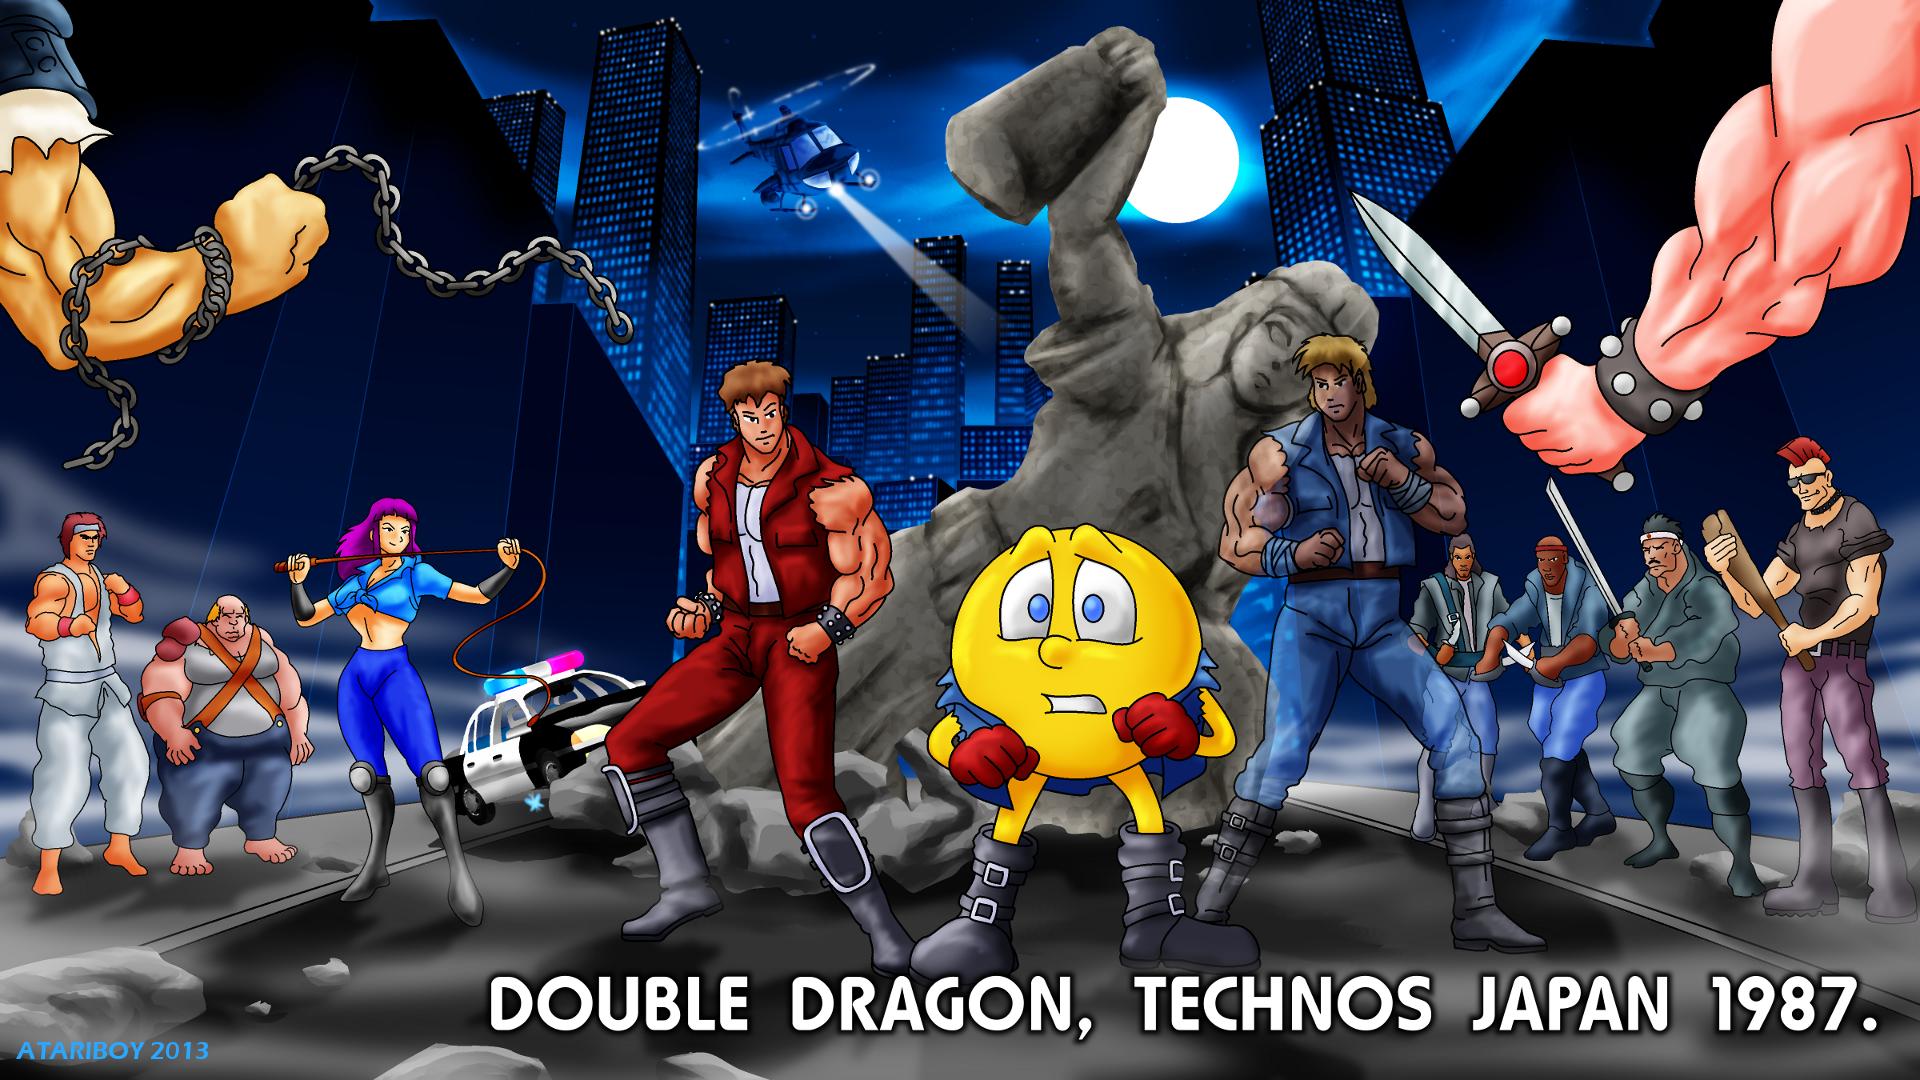 Pacman Deviantart 2019: Double Dragon Fan Art Collection